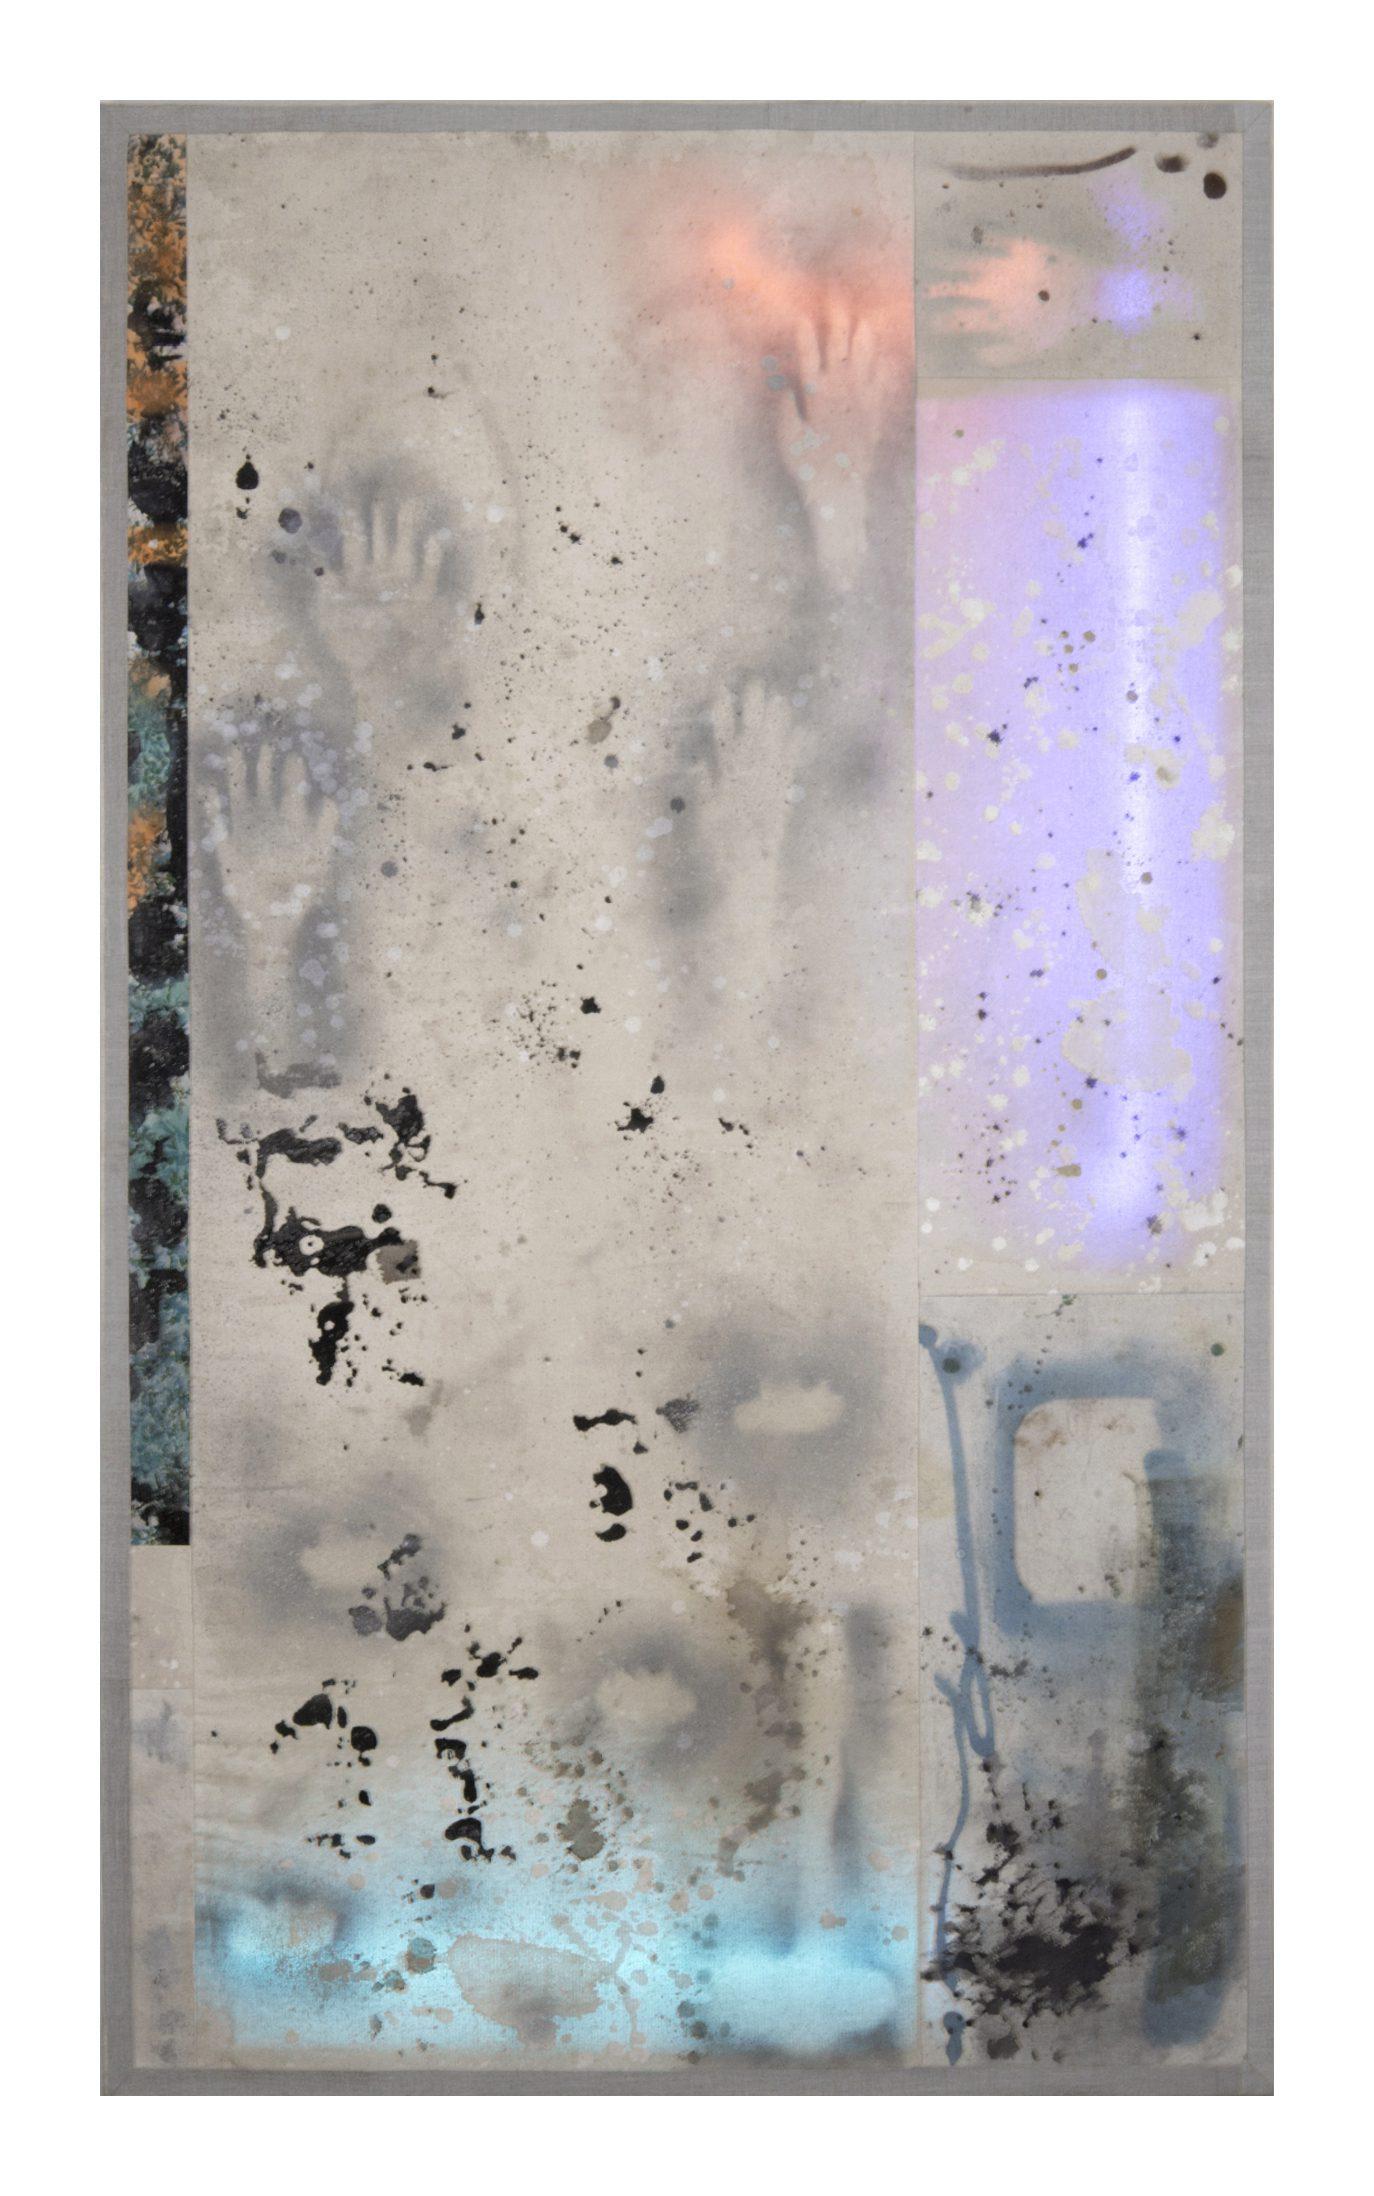 Ignacio Alvaro, Cavern IV, 2021, Mixed media on sewn canvas, neon lights, 160 x 100 cm, Price Available Upon Request, © The Artist